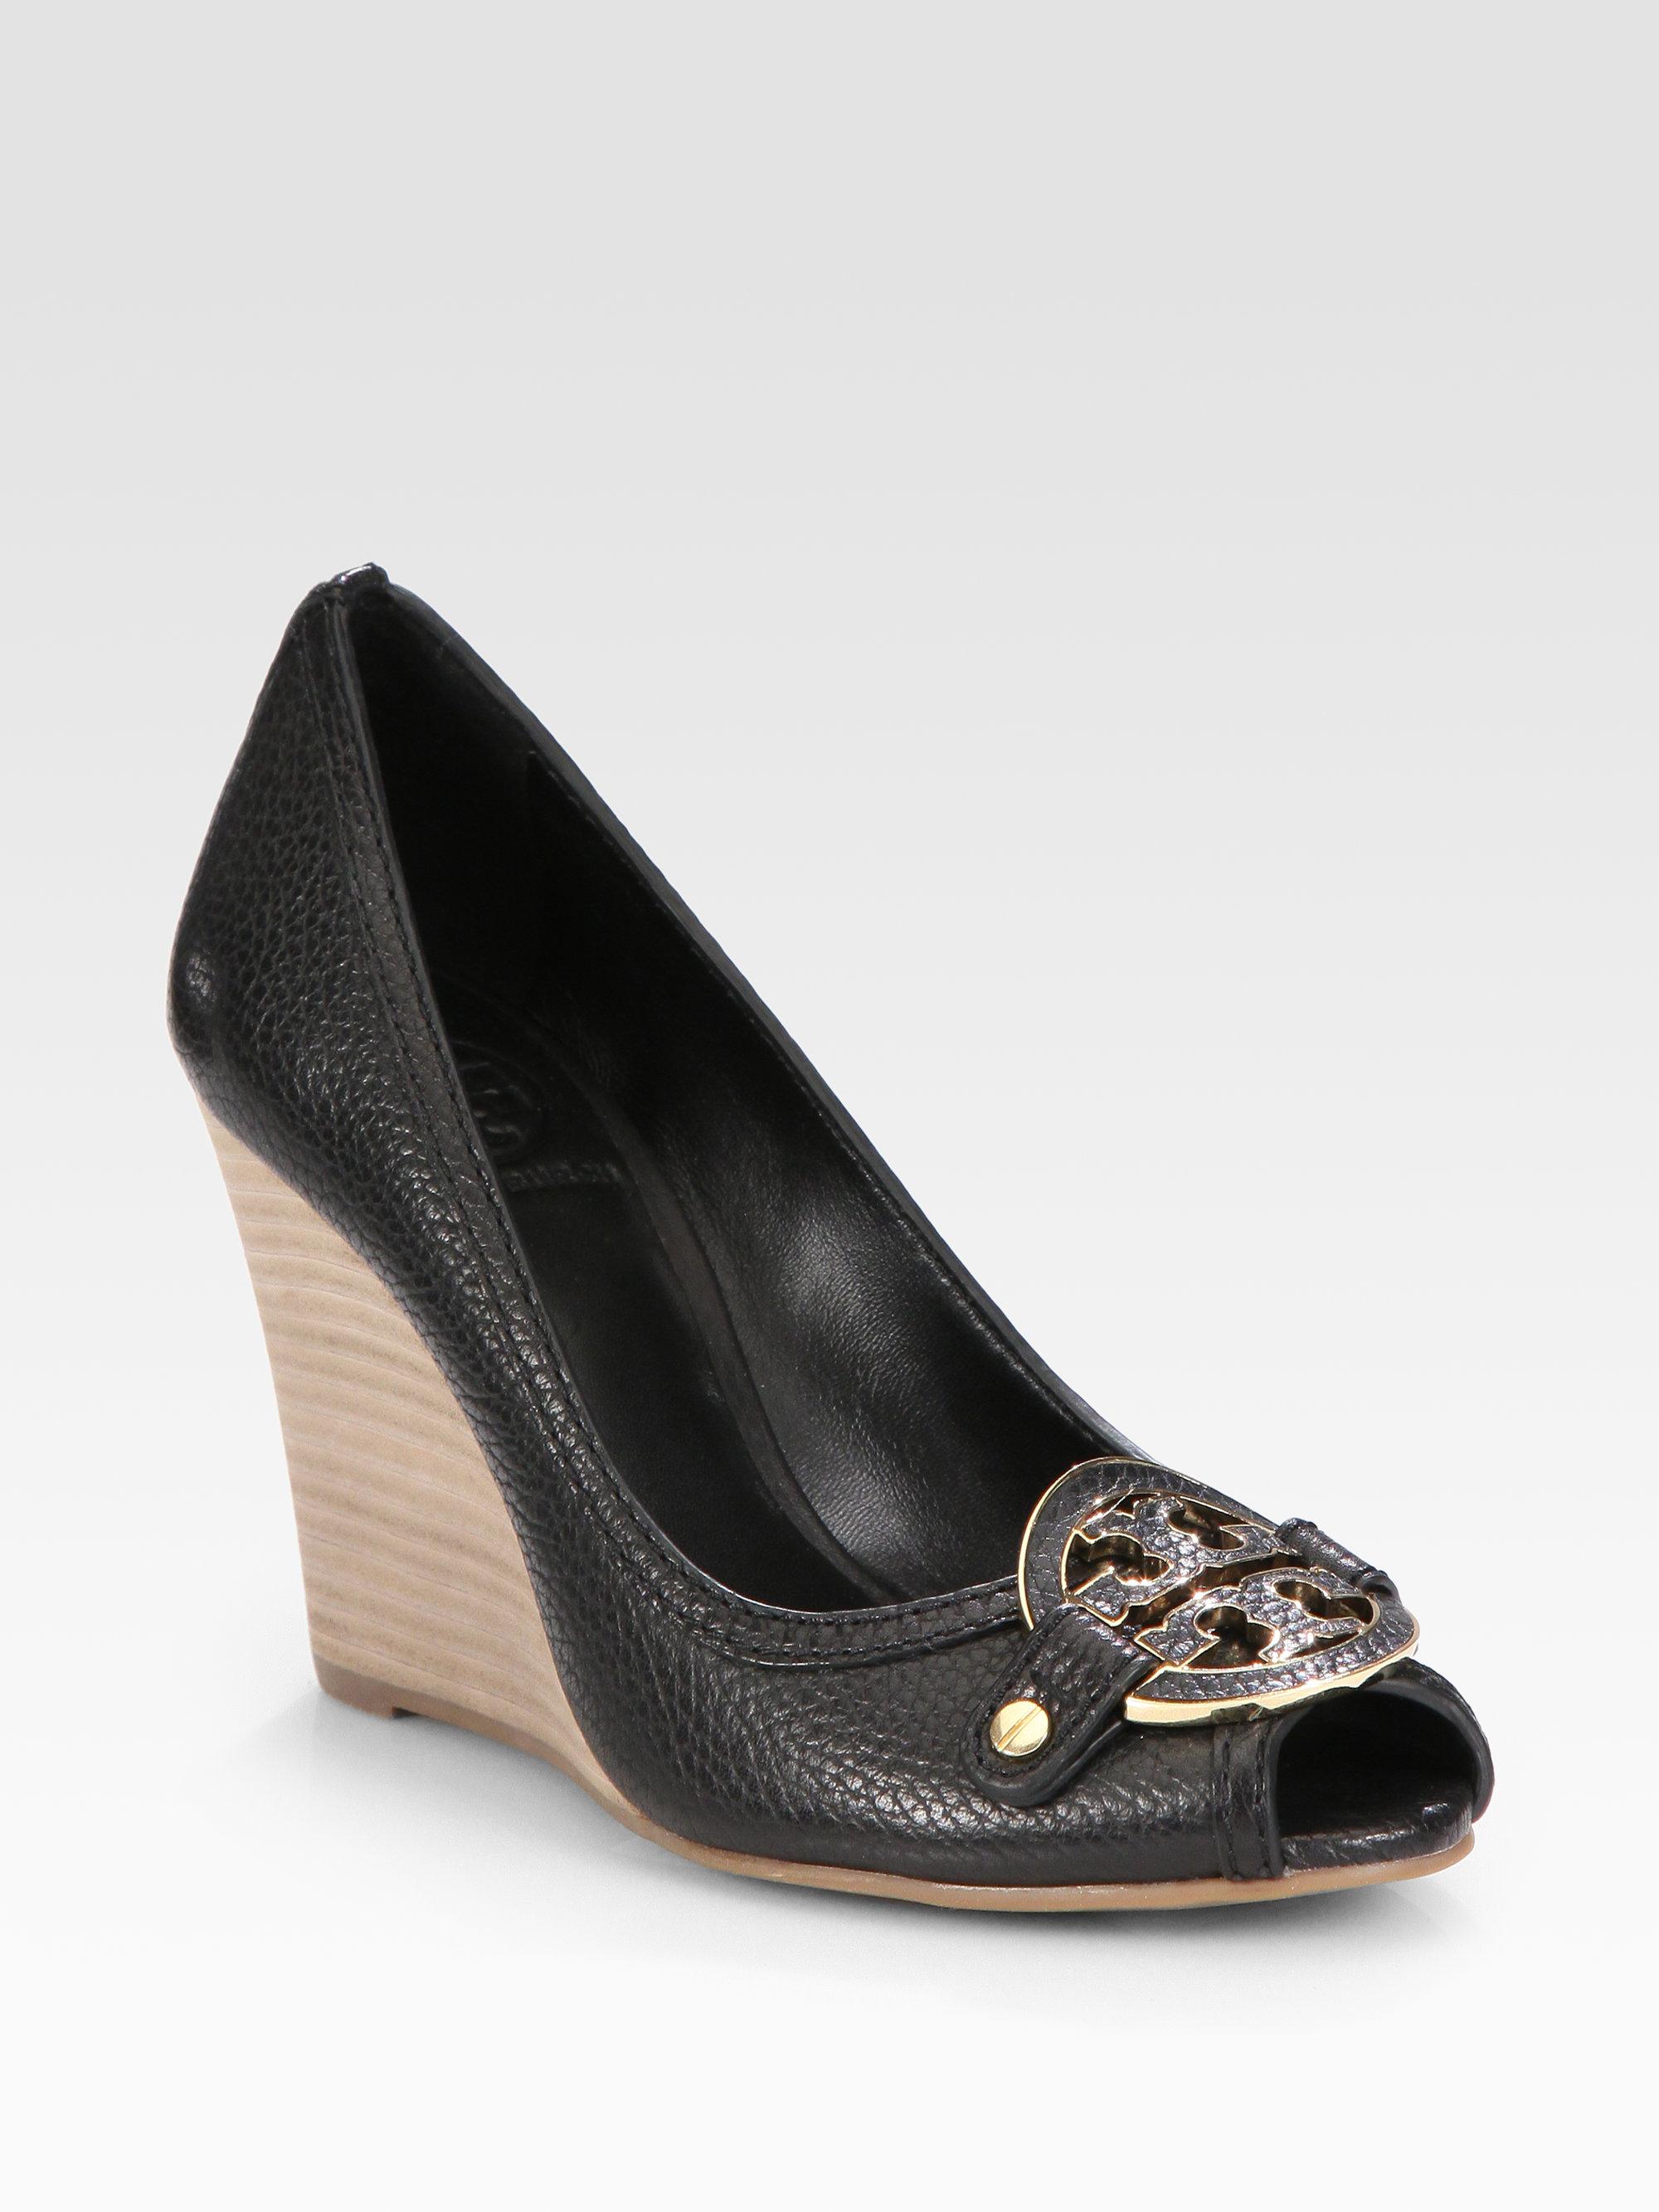 51d3533d385 Tory Burch Black Amanda Leather Logo Peep Toe Wedge Pumps